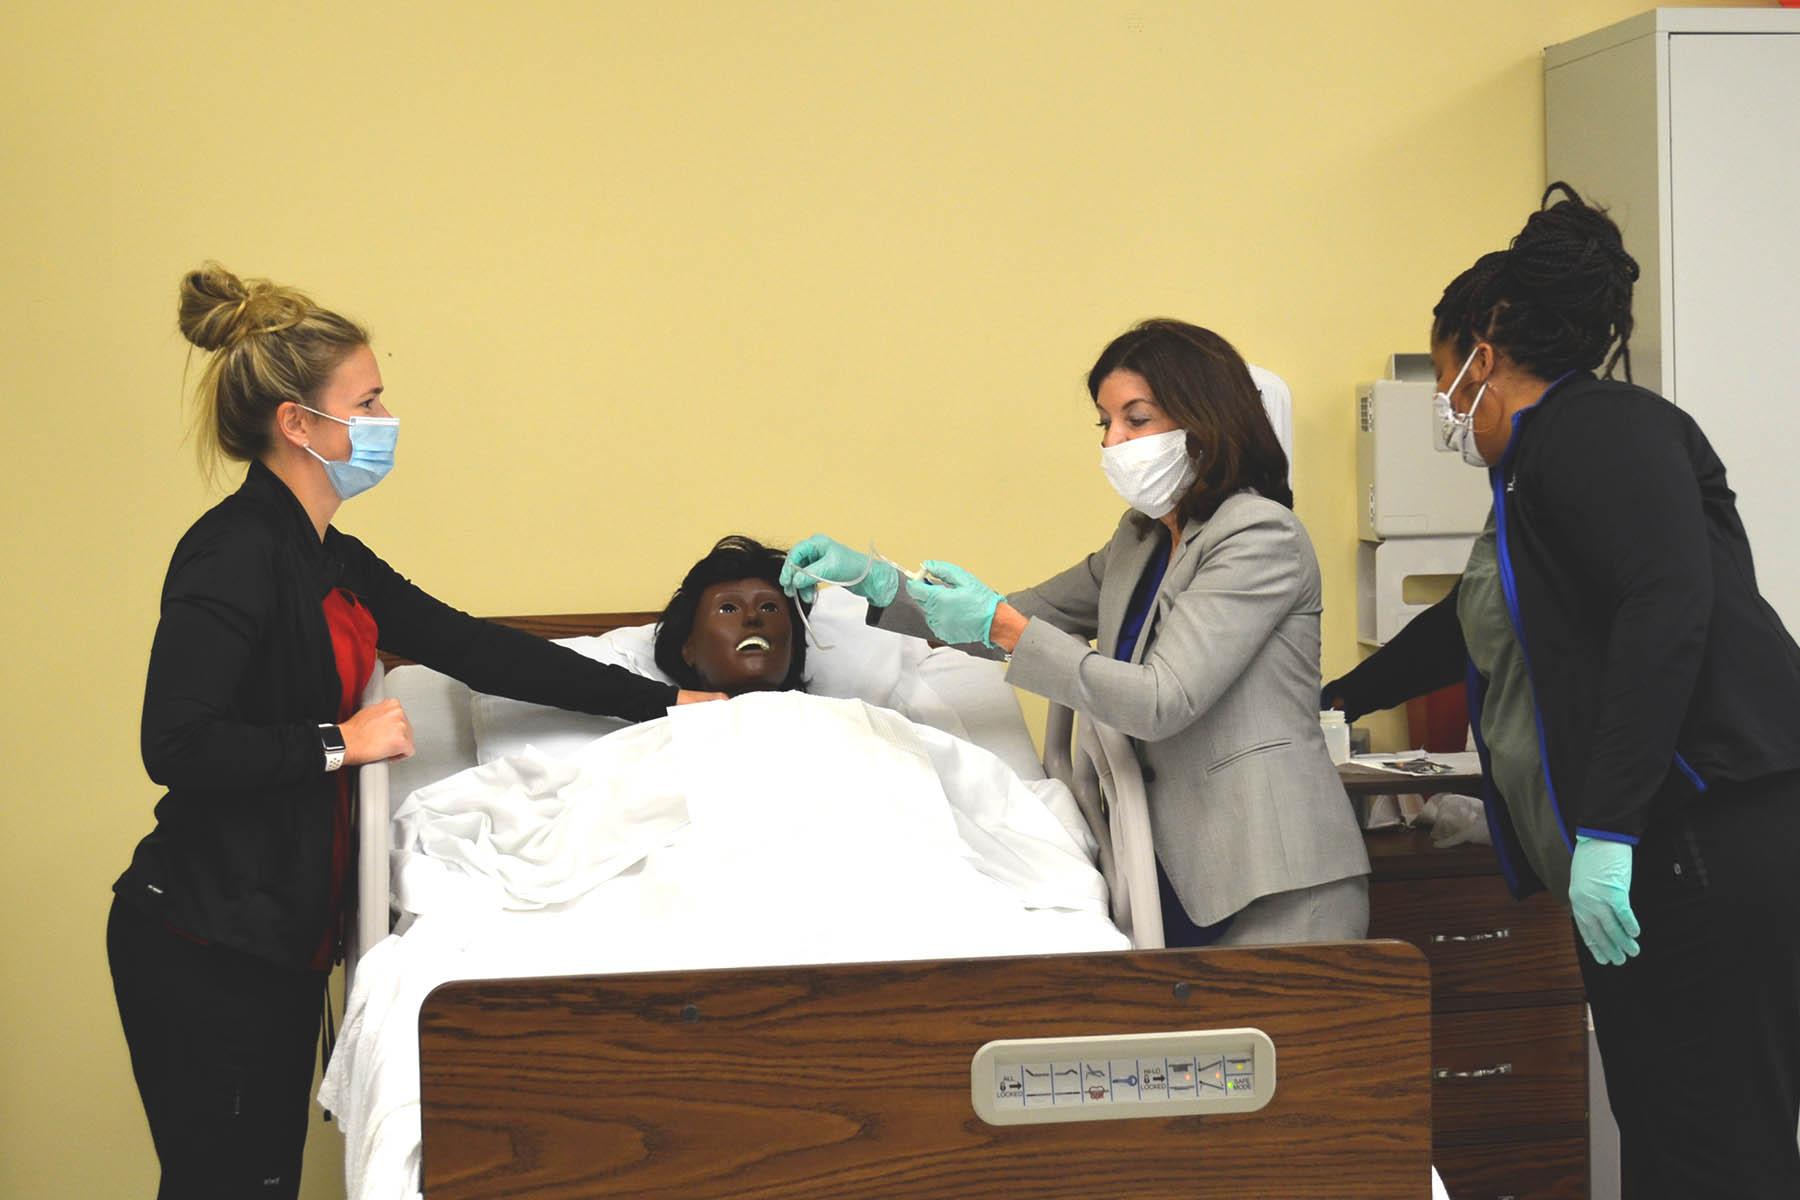 Lt. Gov. Hochul in WFD Nursing Class